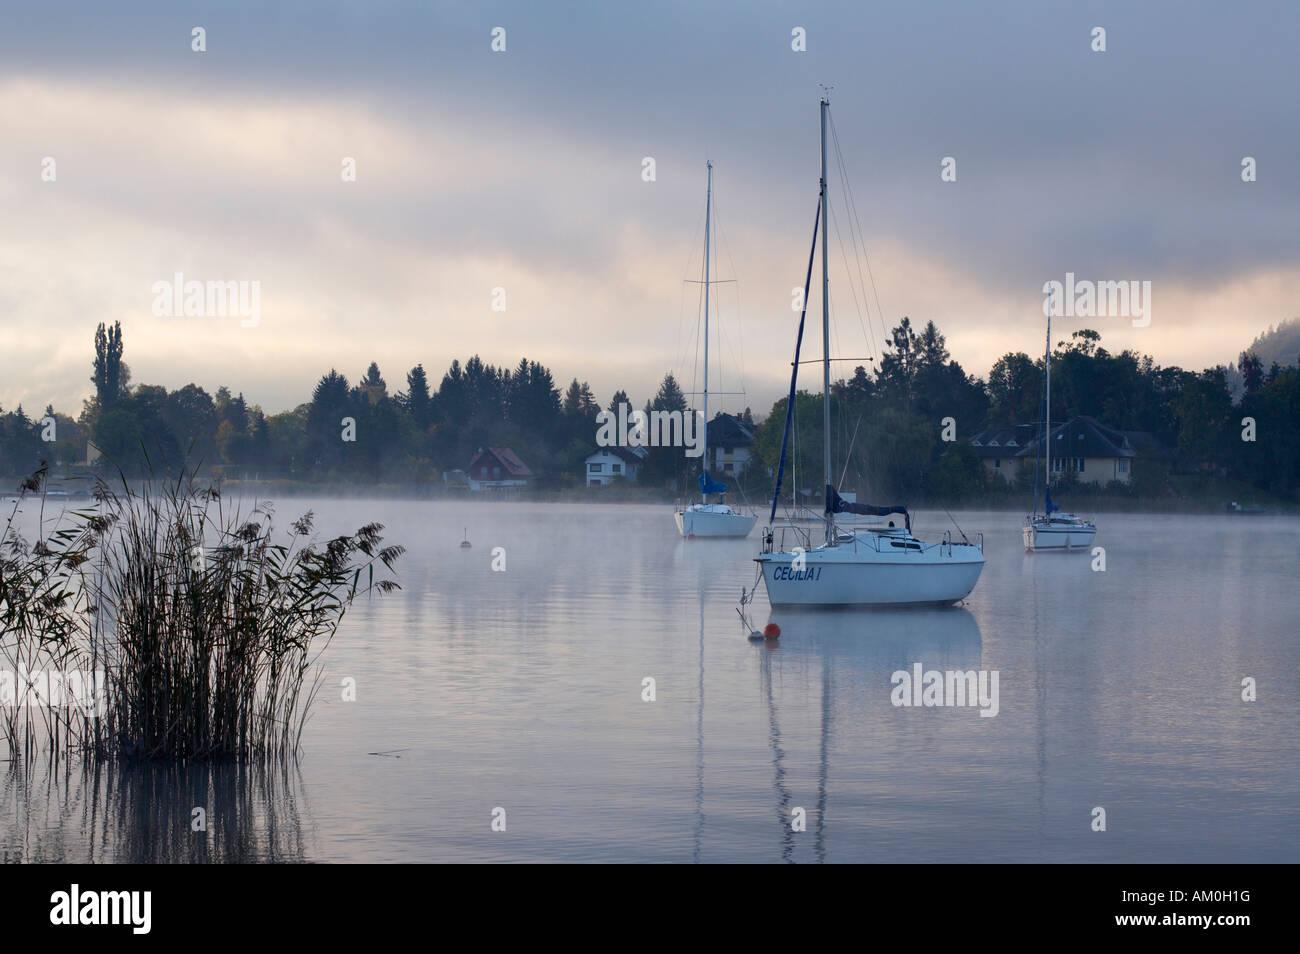 Boats on Woerthersee lake, Poertschach, Carinthia, Austria Stock Photo